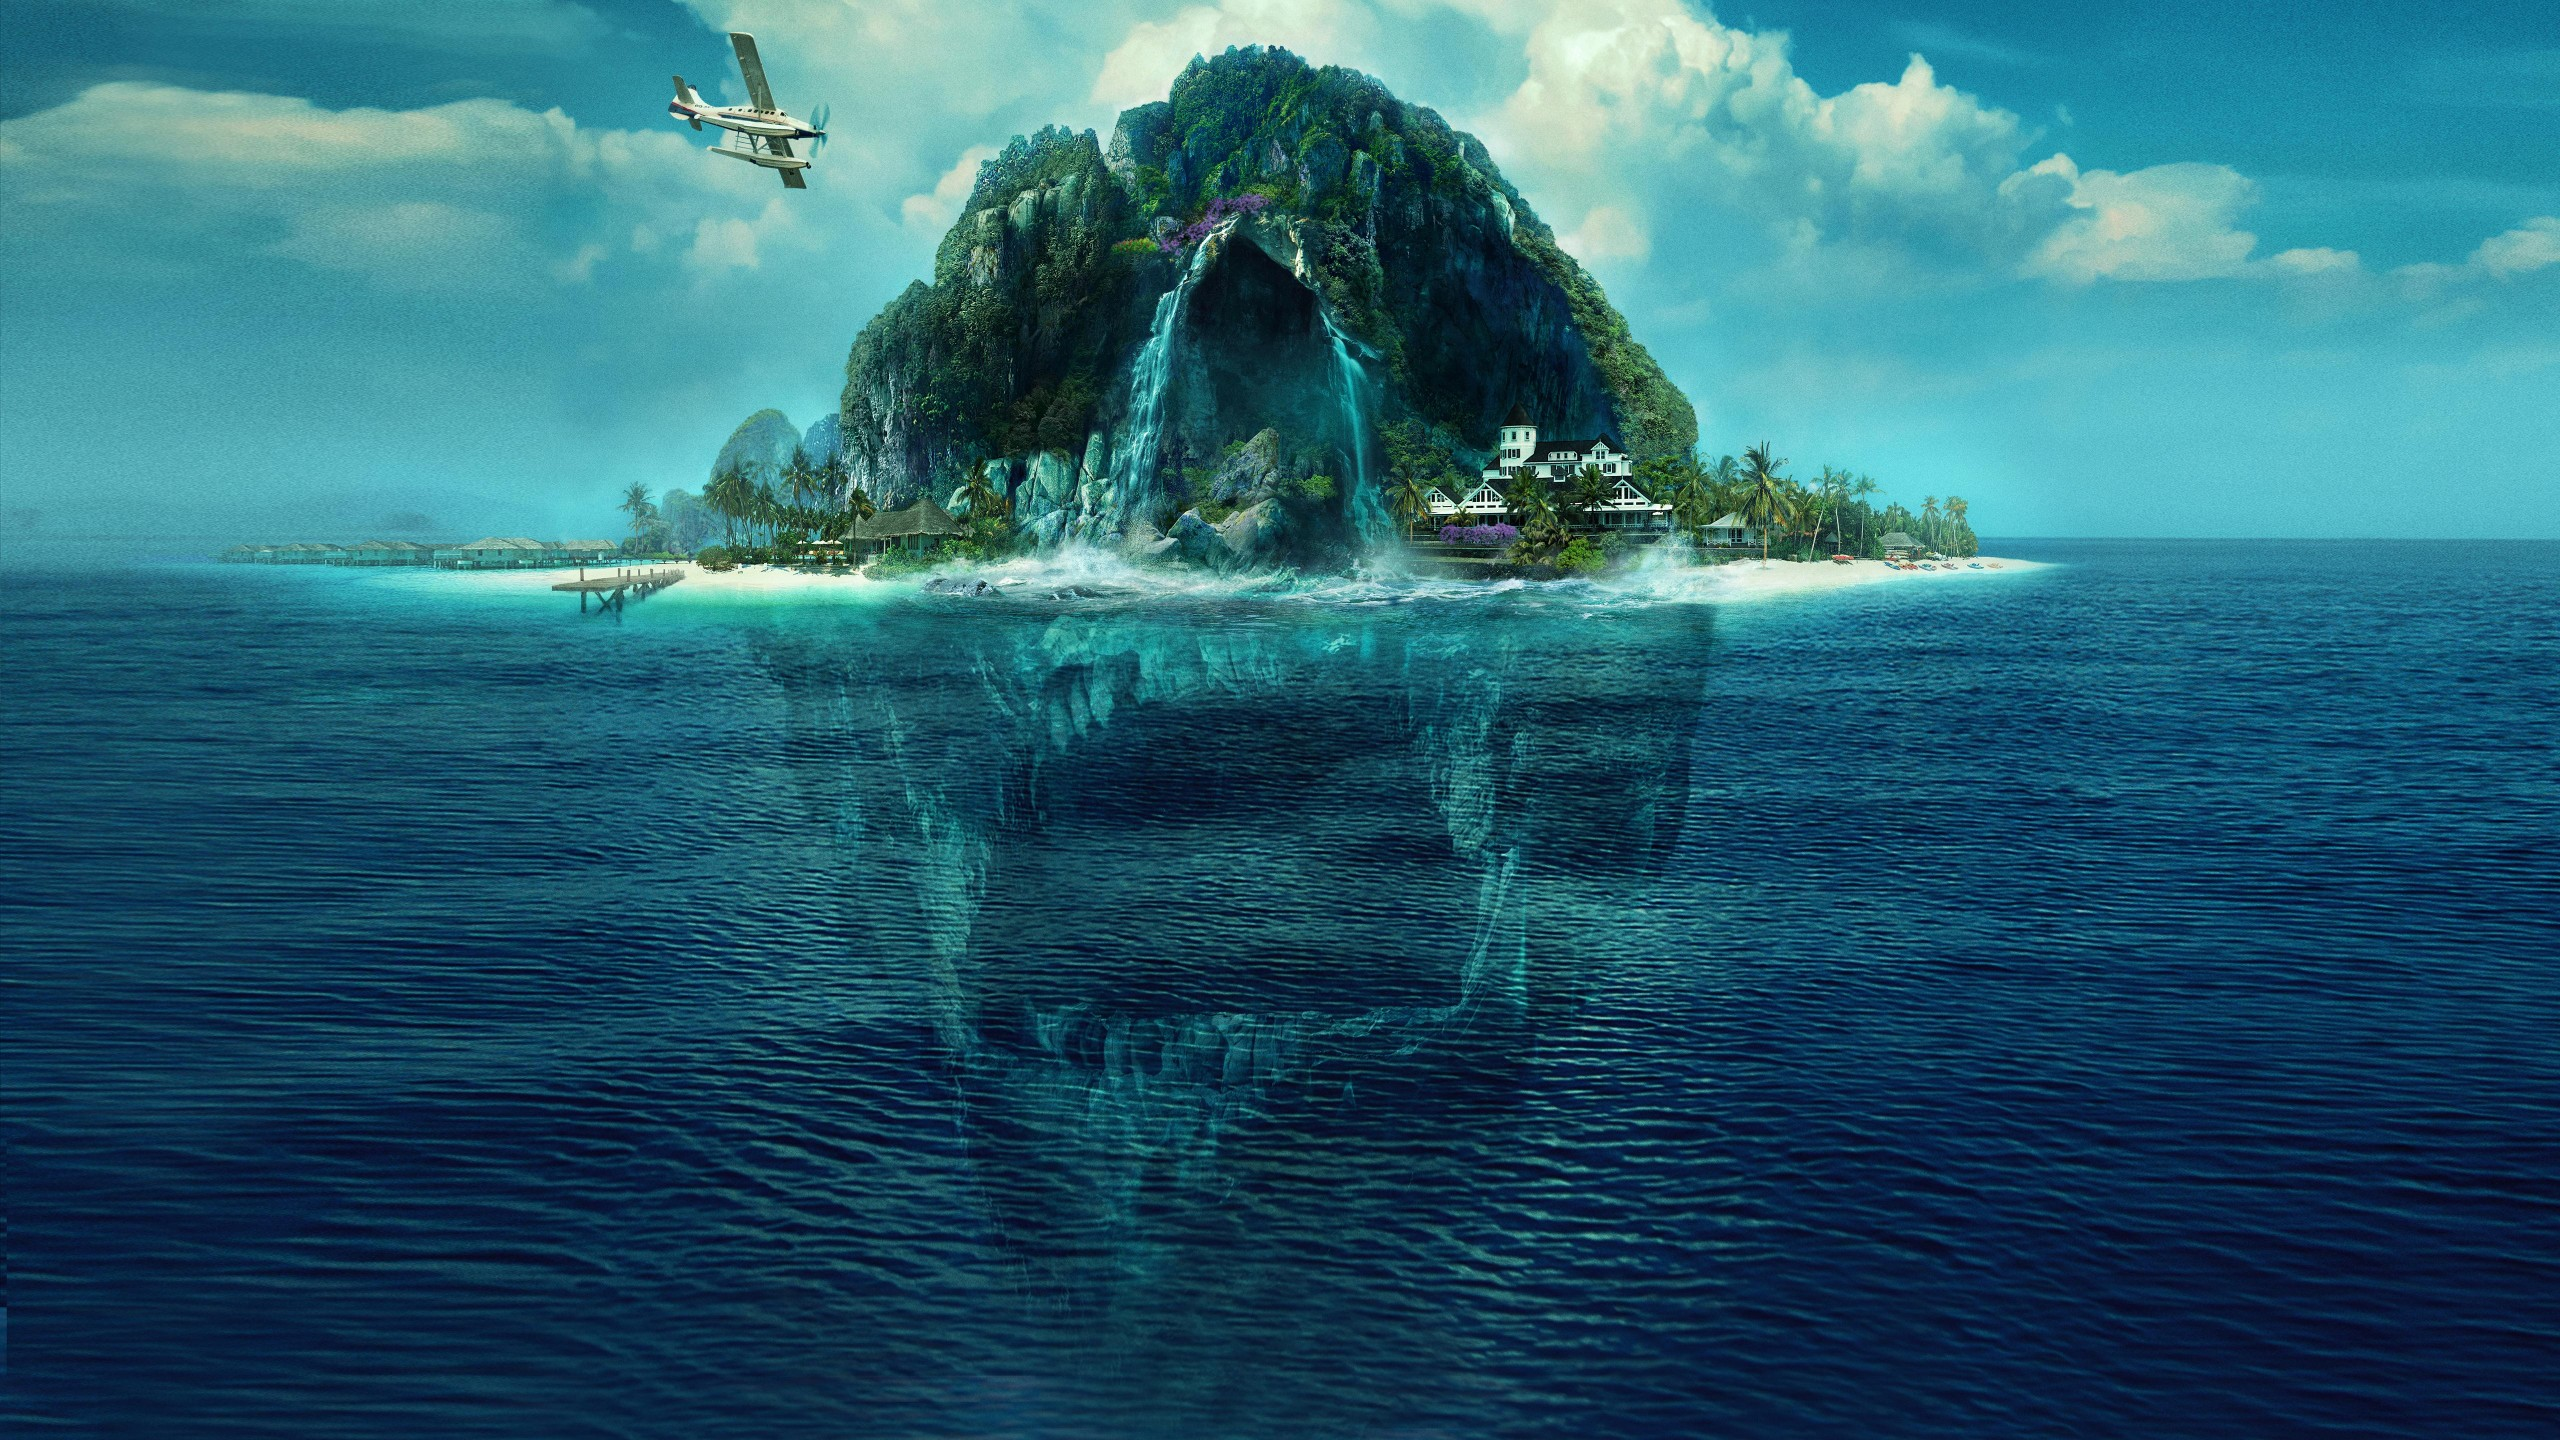 Fantasy Island 2020 4K 5K HD desktop wallpaper Widescreen High 2560x1440